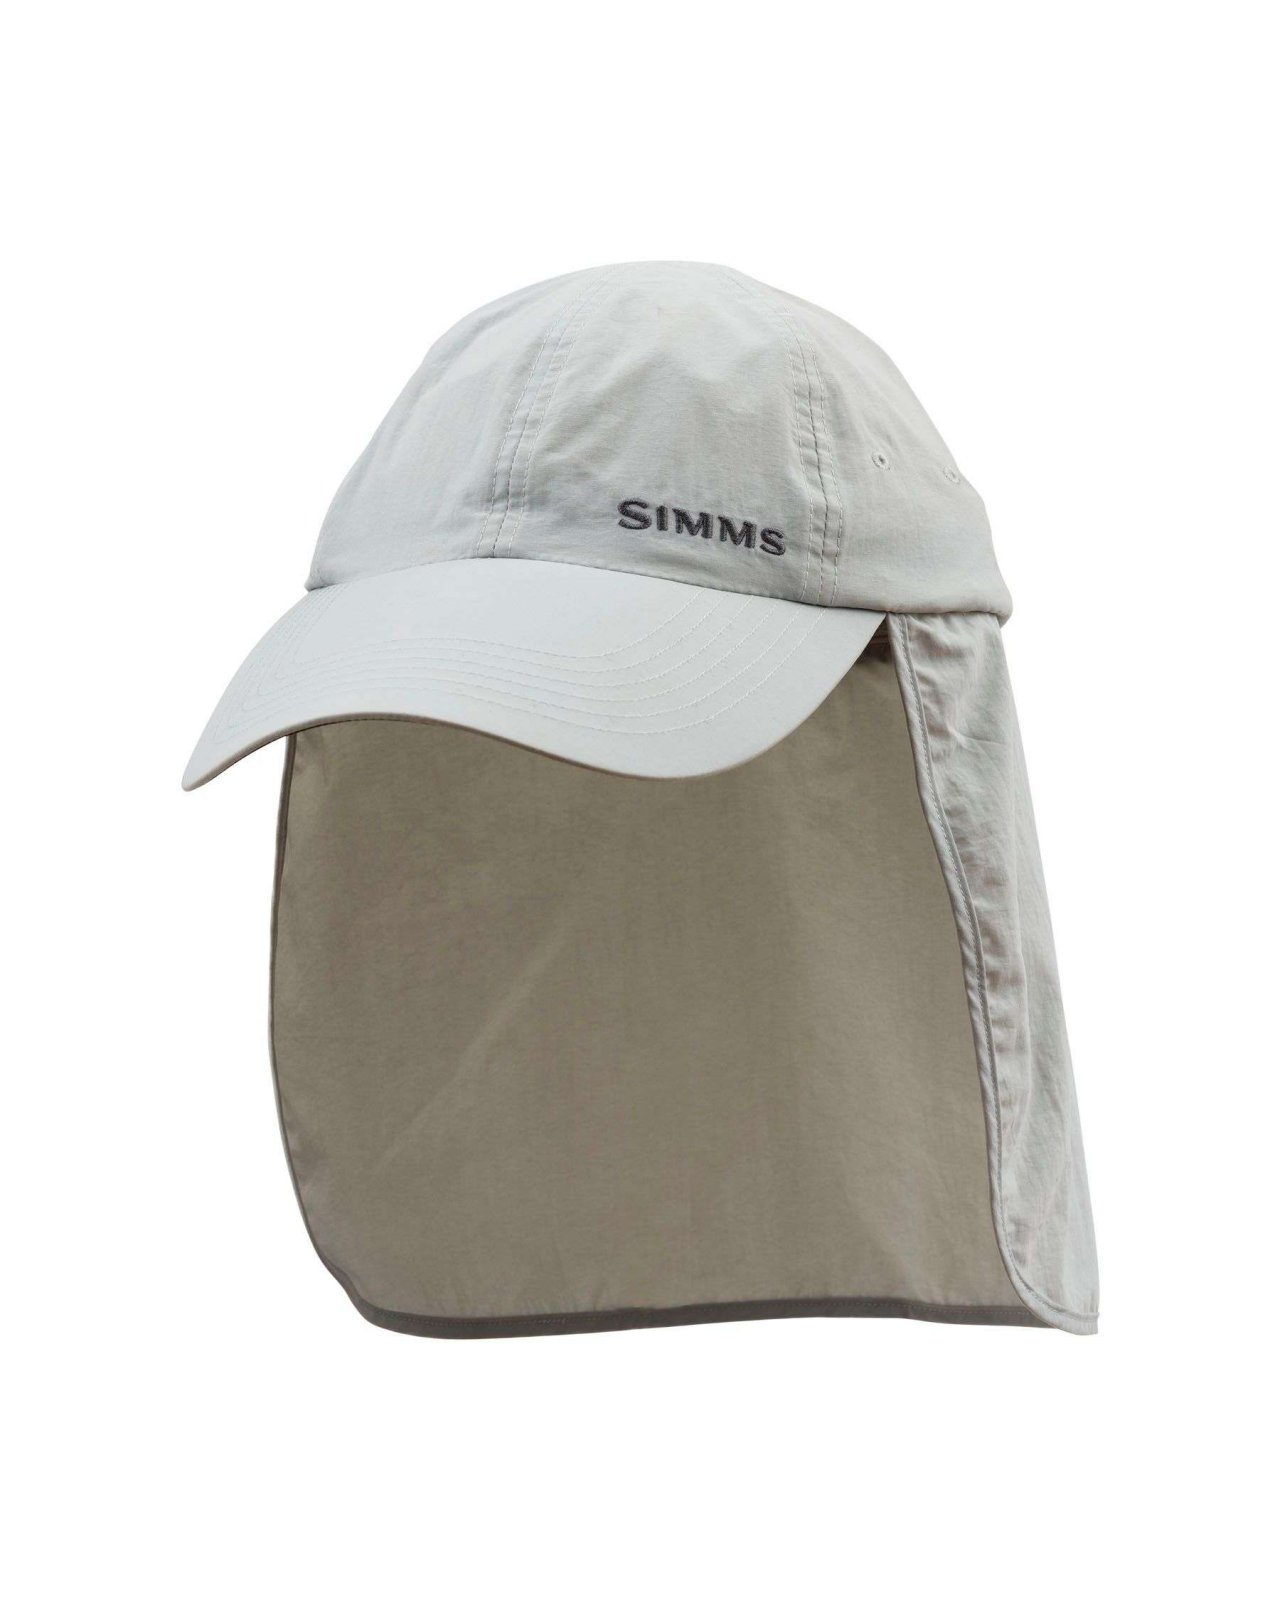 Simms Superlight Sunshield Cap - Sterling